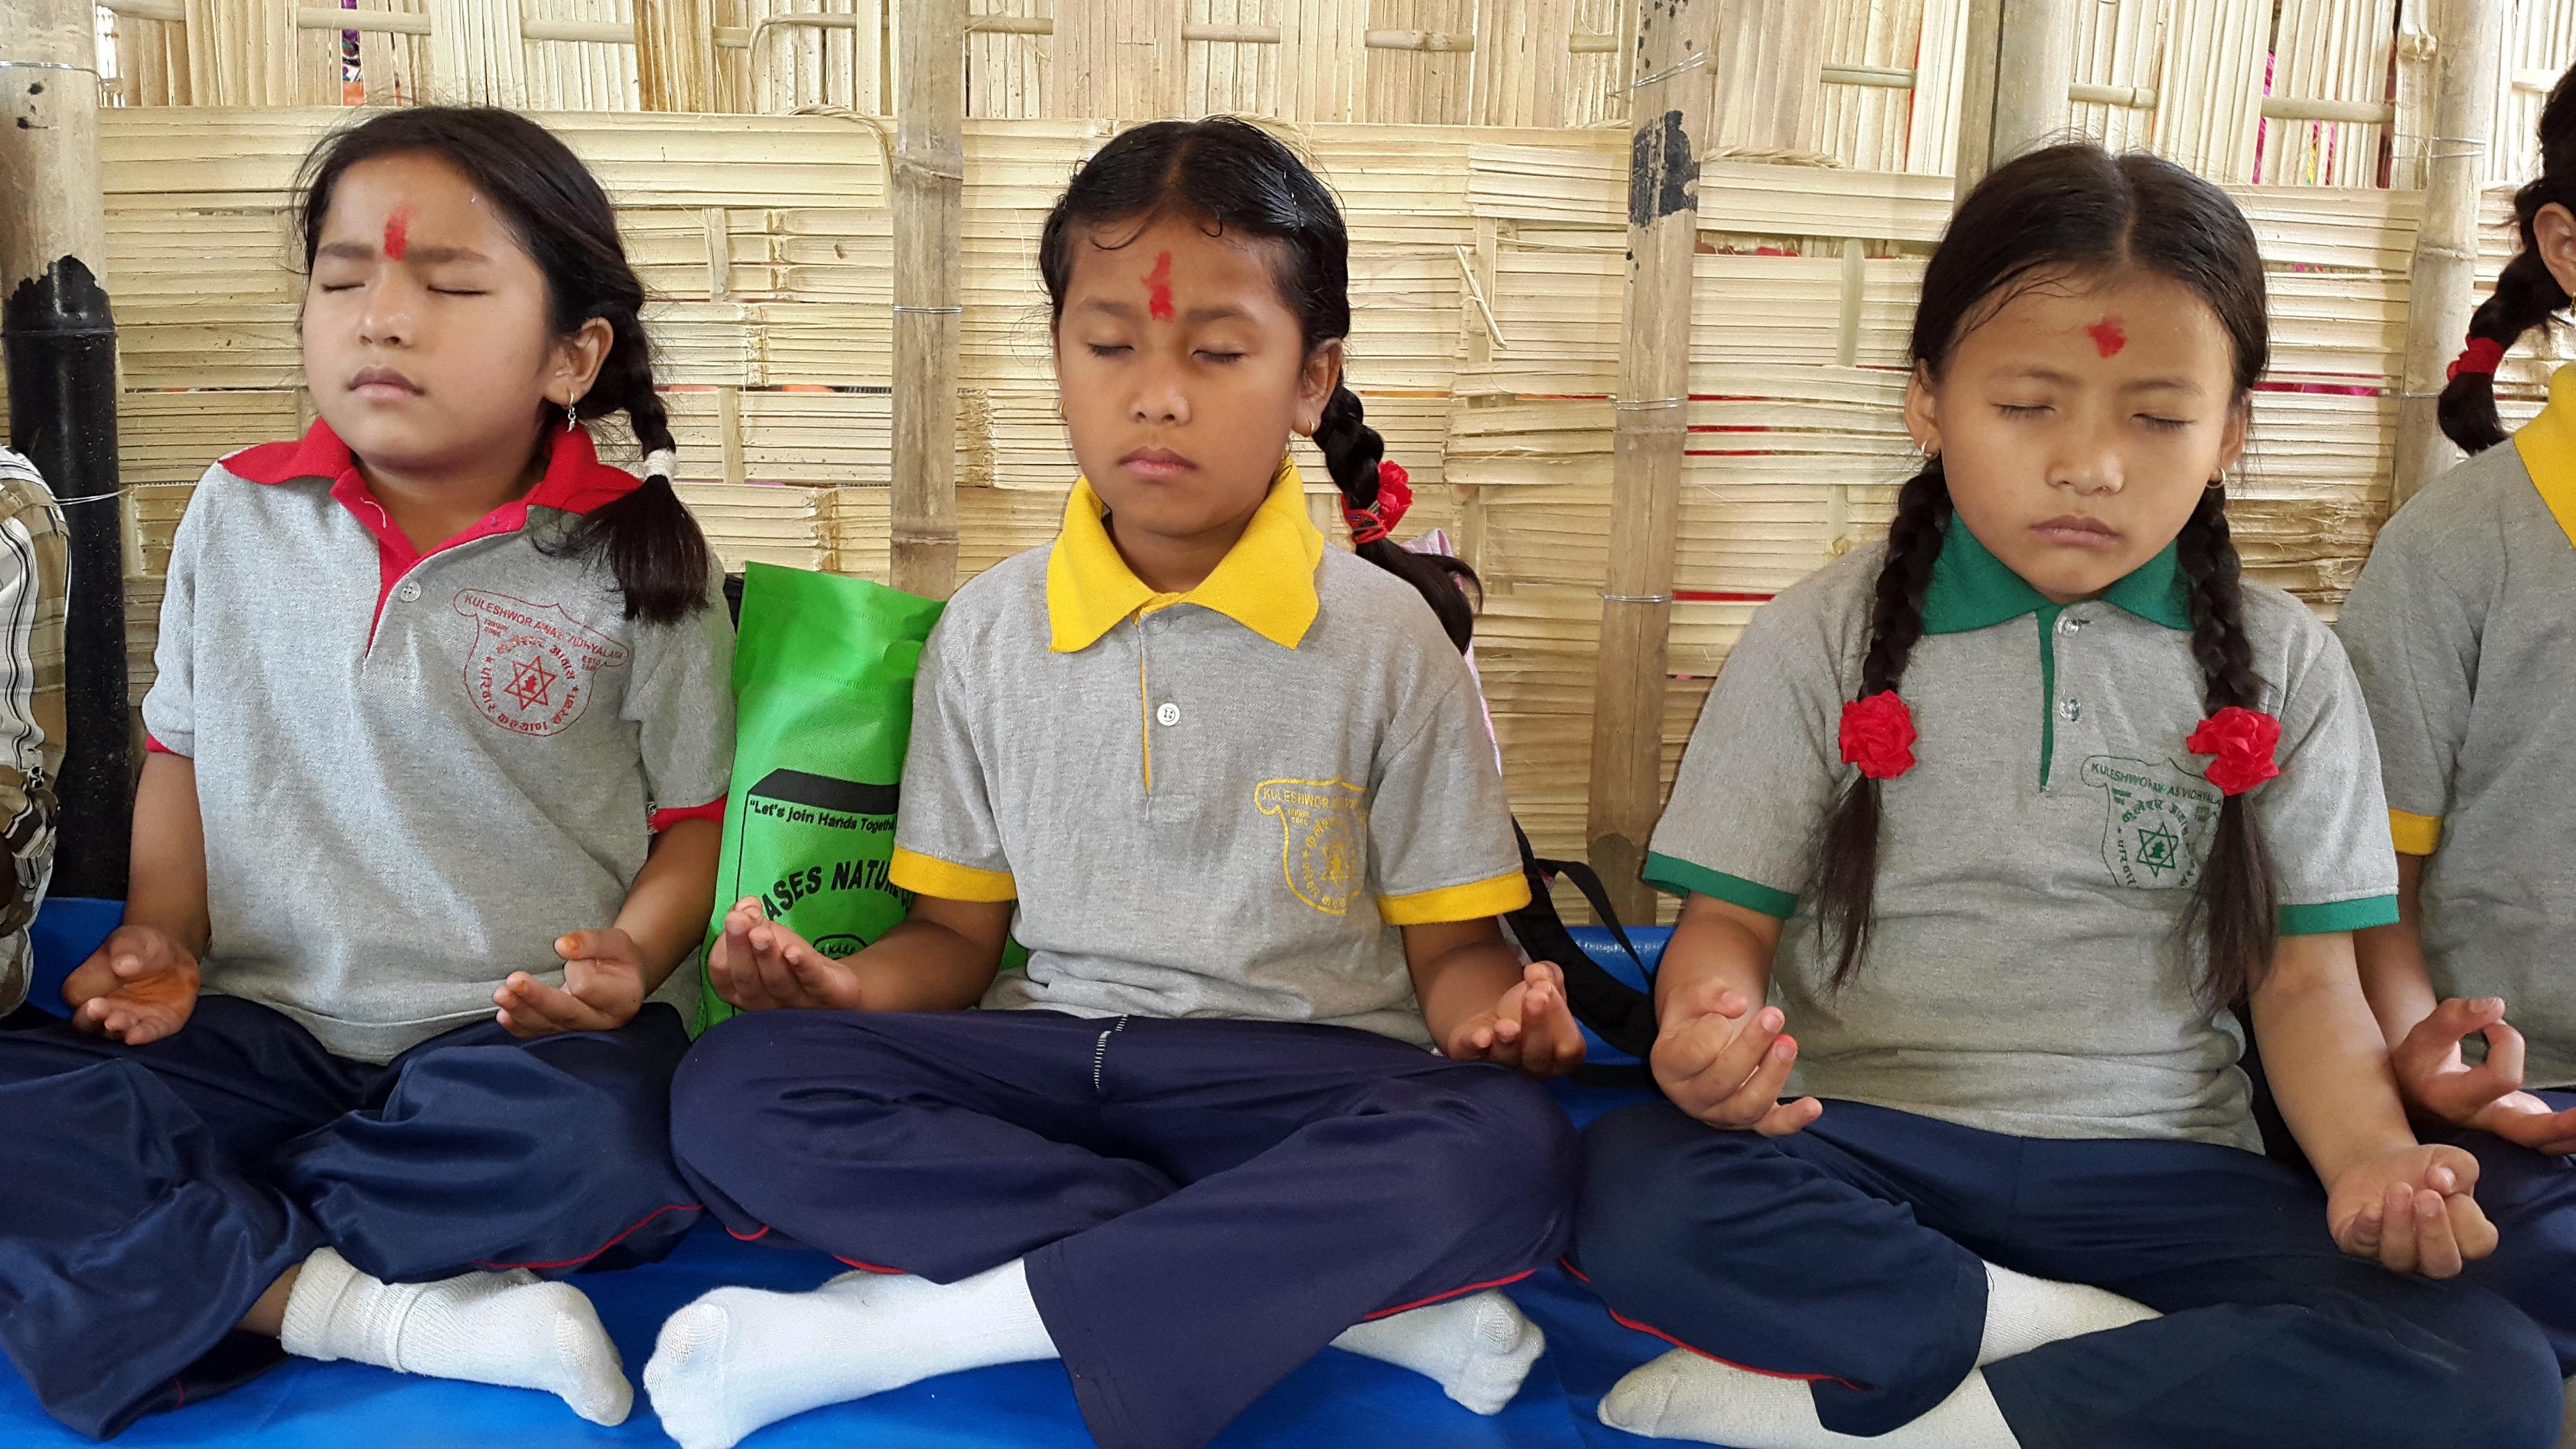 Pienet tytöt meditoivat.